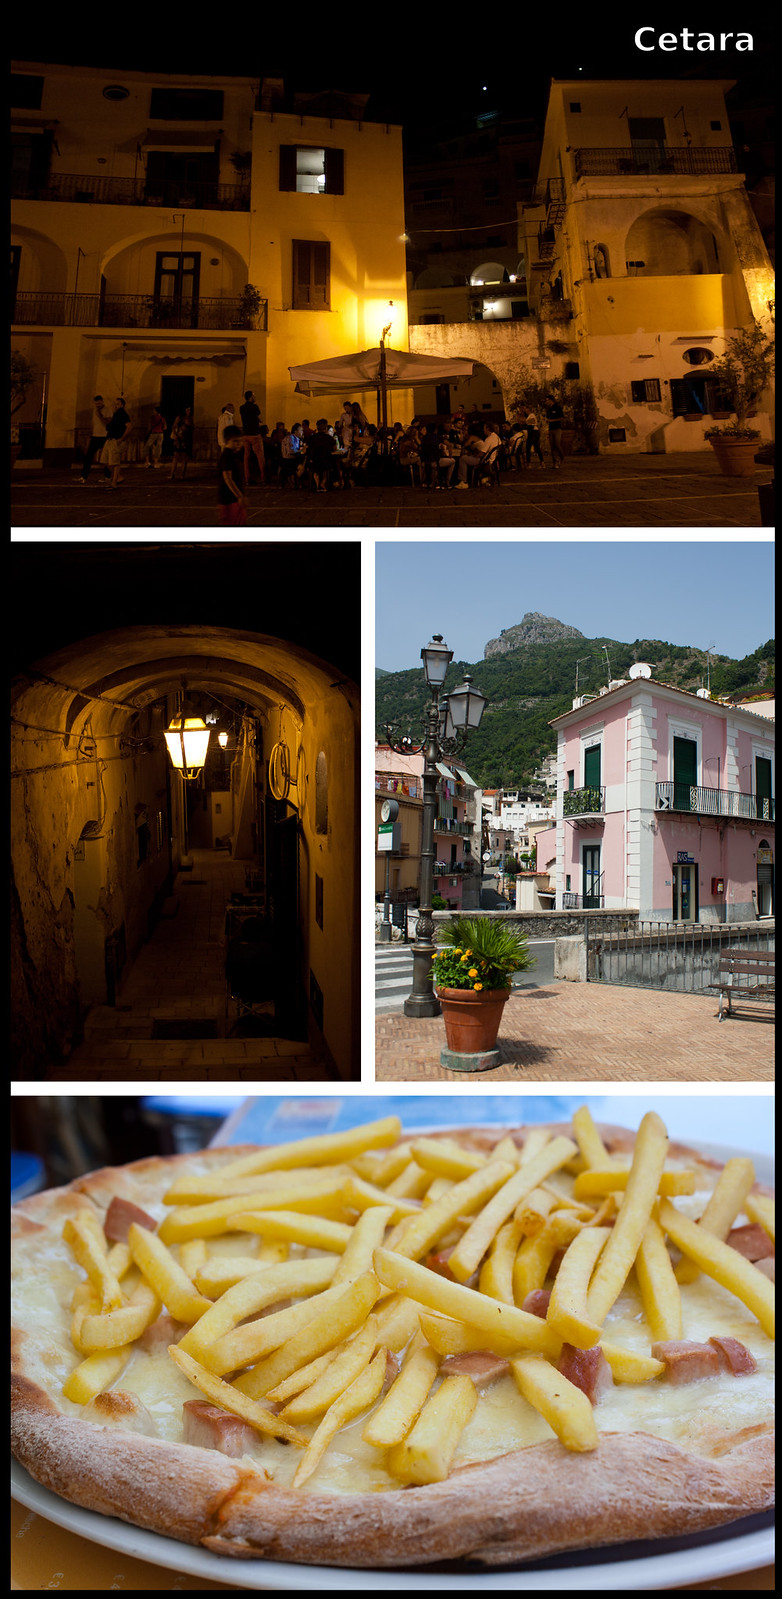 Cetara - Costa Amalfitana